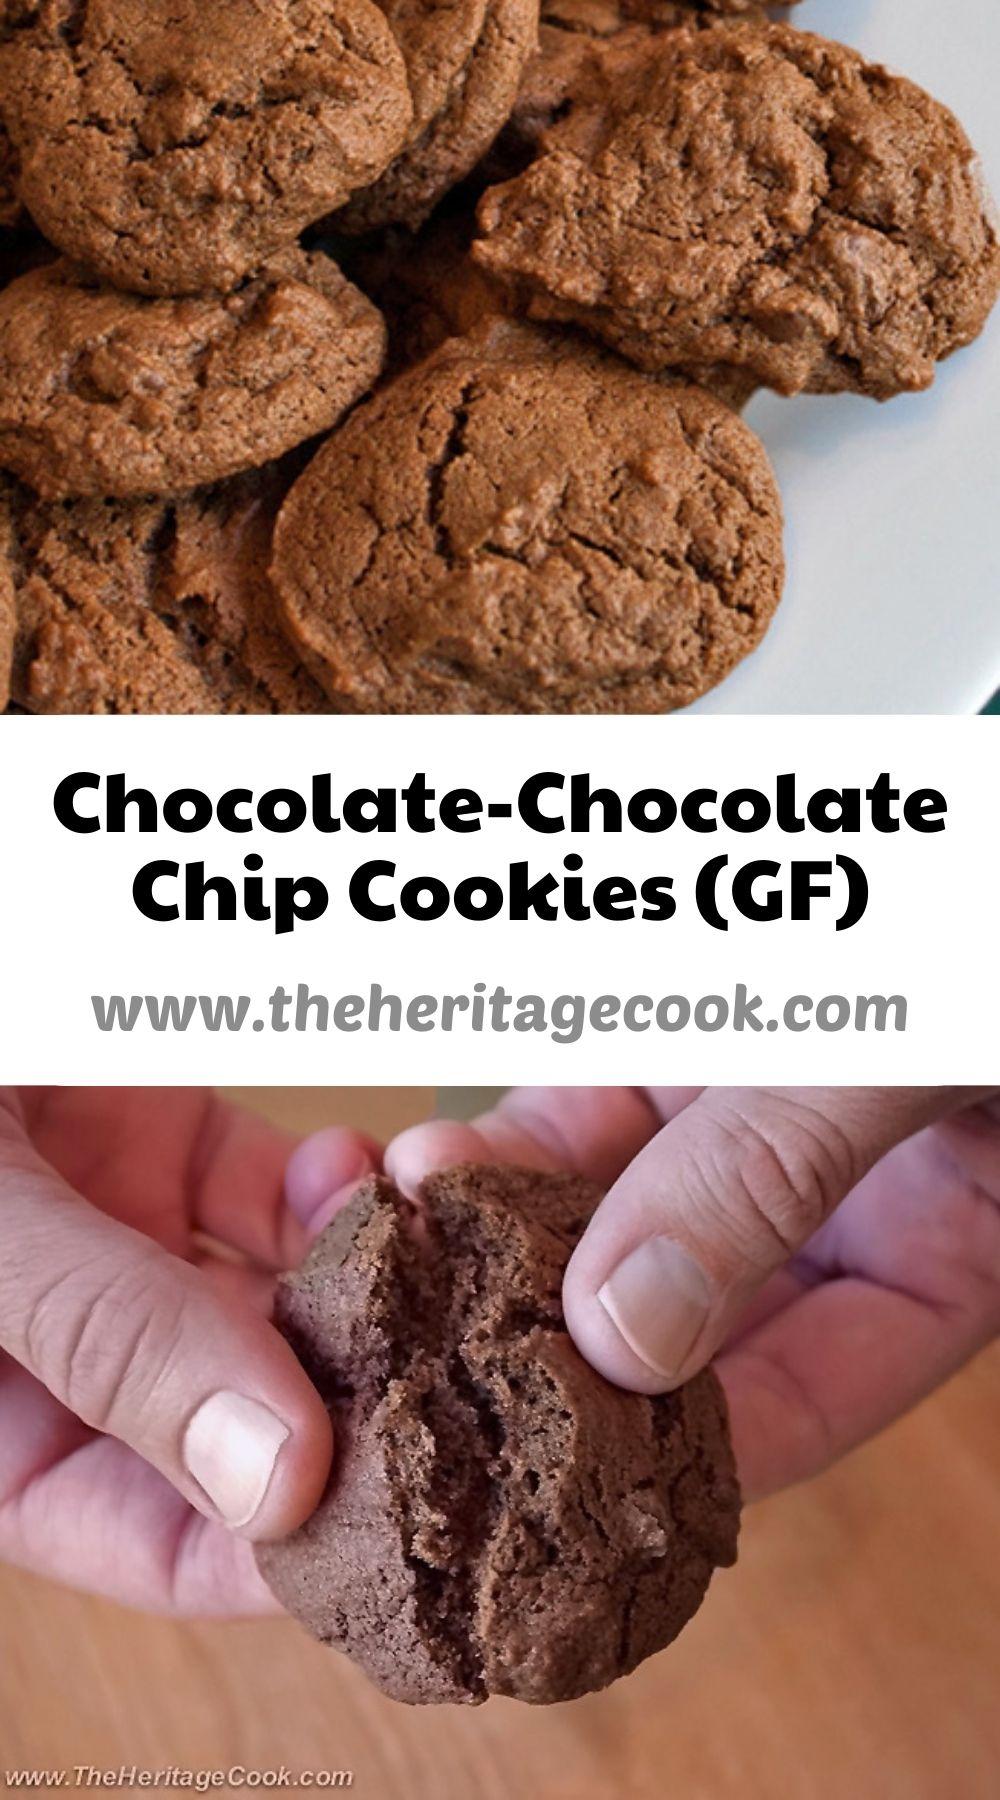 Chocolate-Chocolate Chip Cookies; 2021 Jane Bonacci, The Heritage Cook